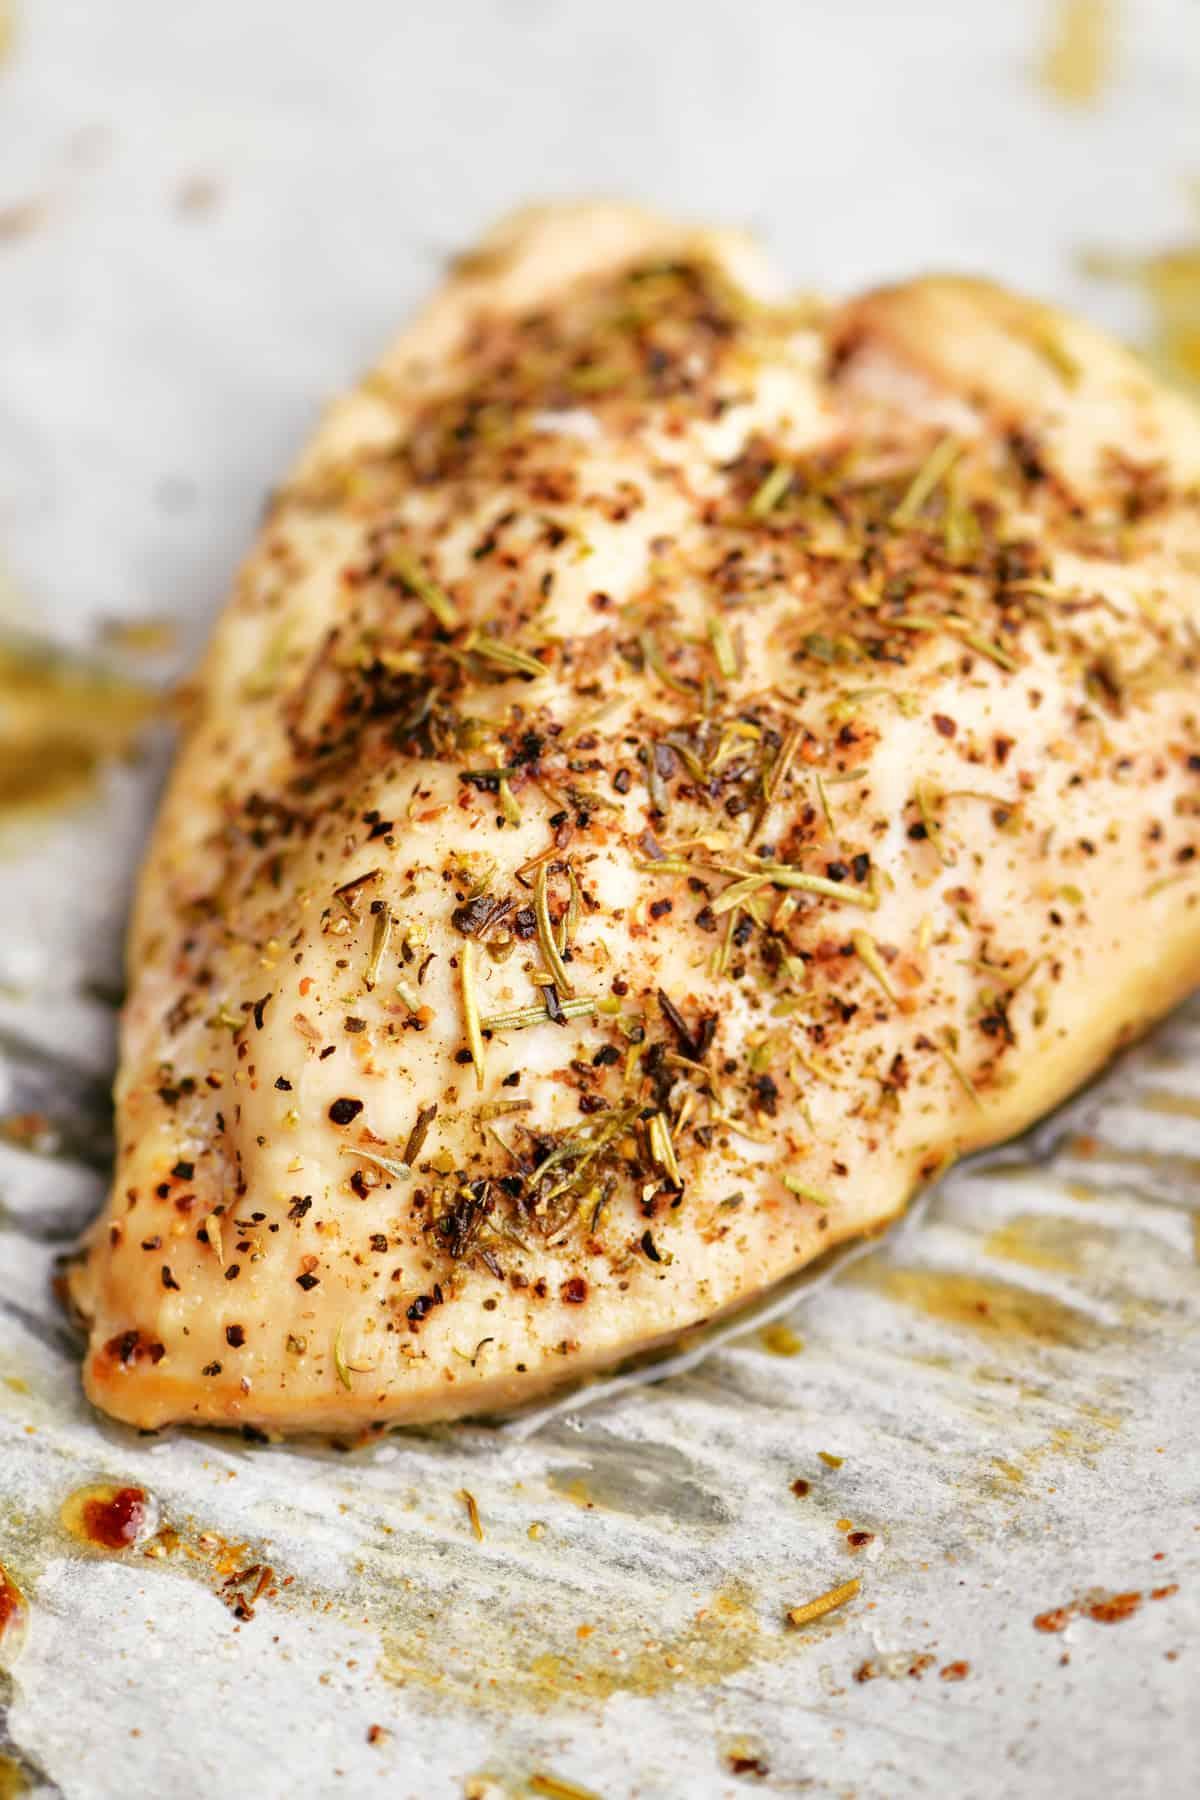 a seasoned piece of chicken